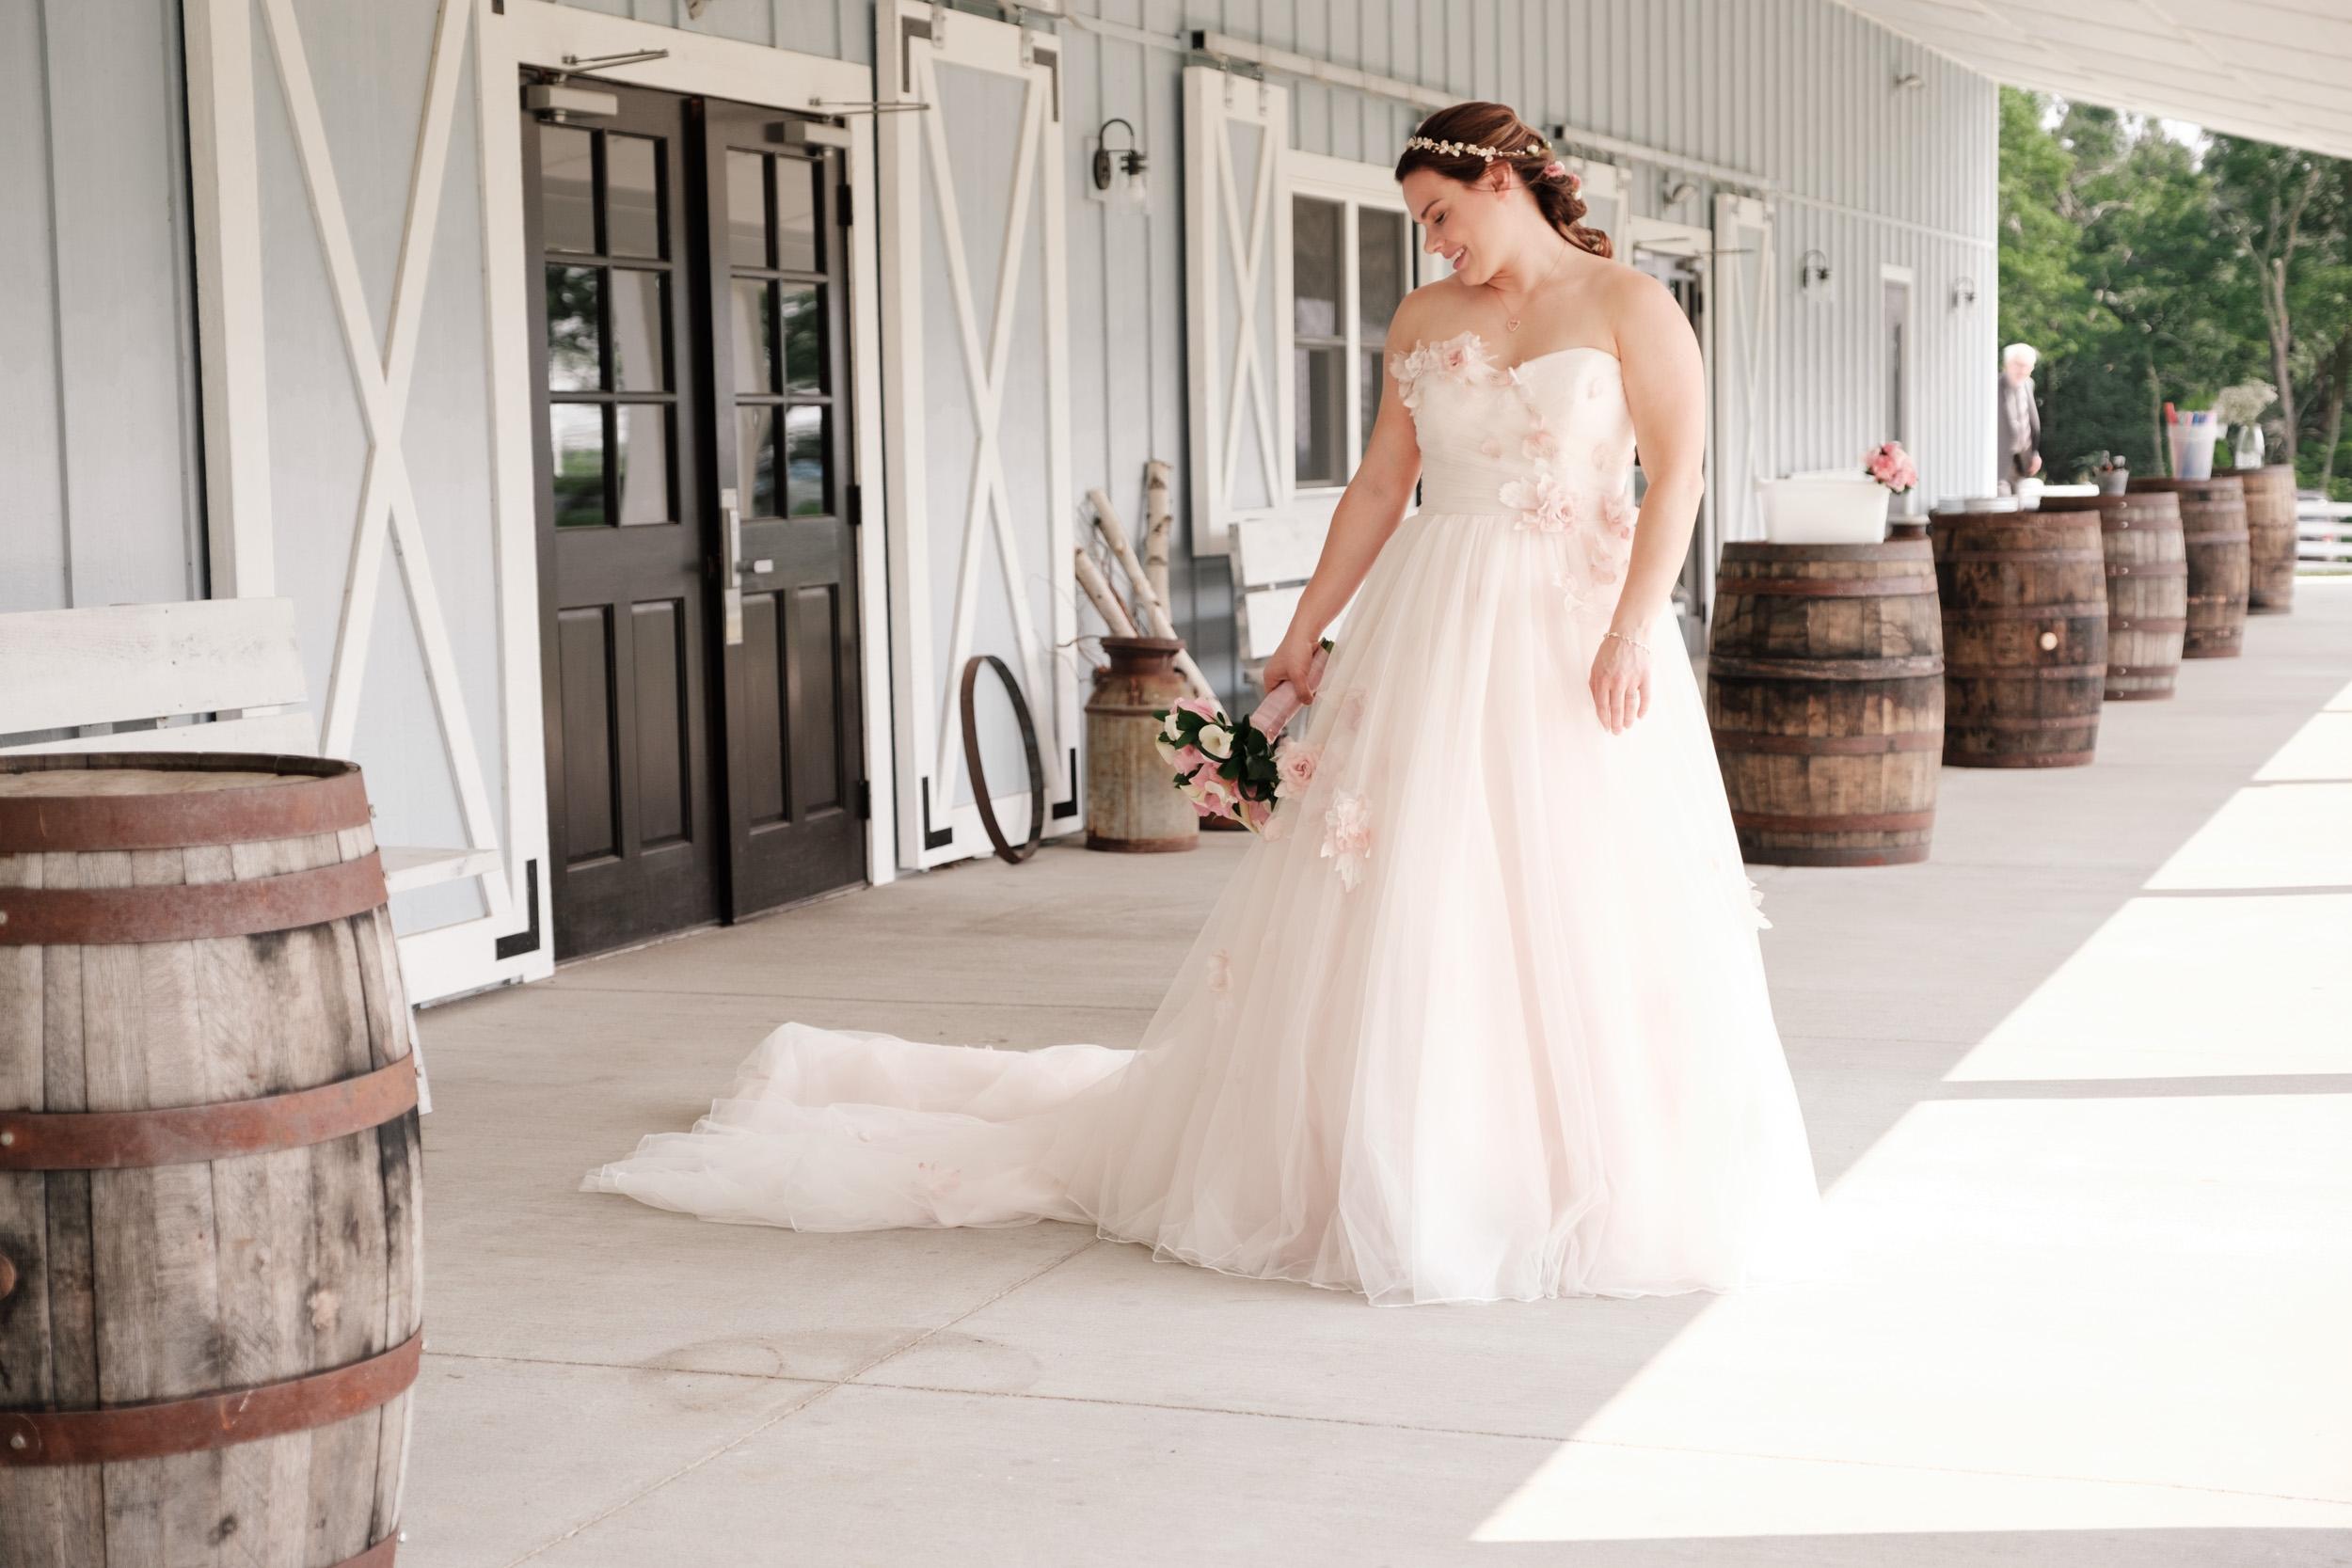 19-06-22-Ryan-Katie-The-Fields-Reserve-Wedding-15.jpg